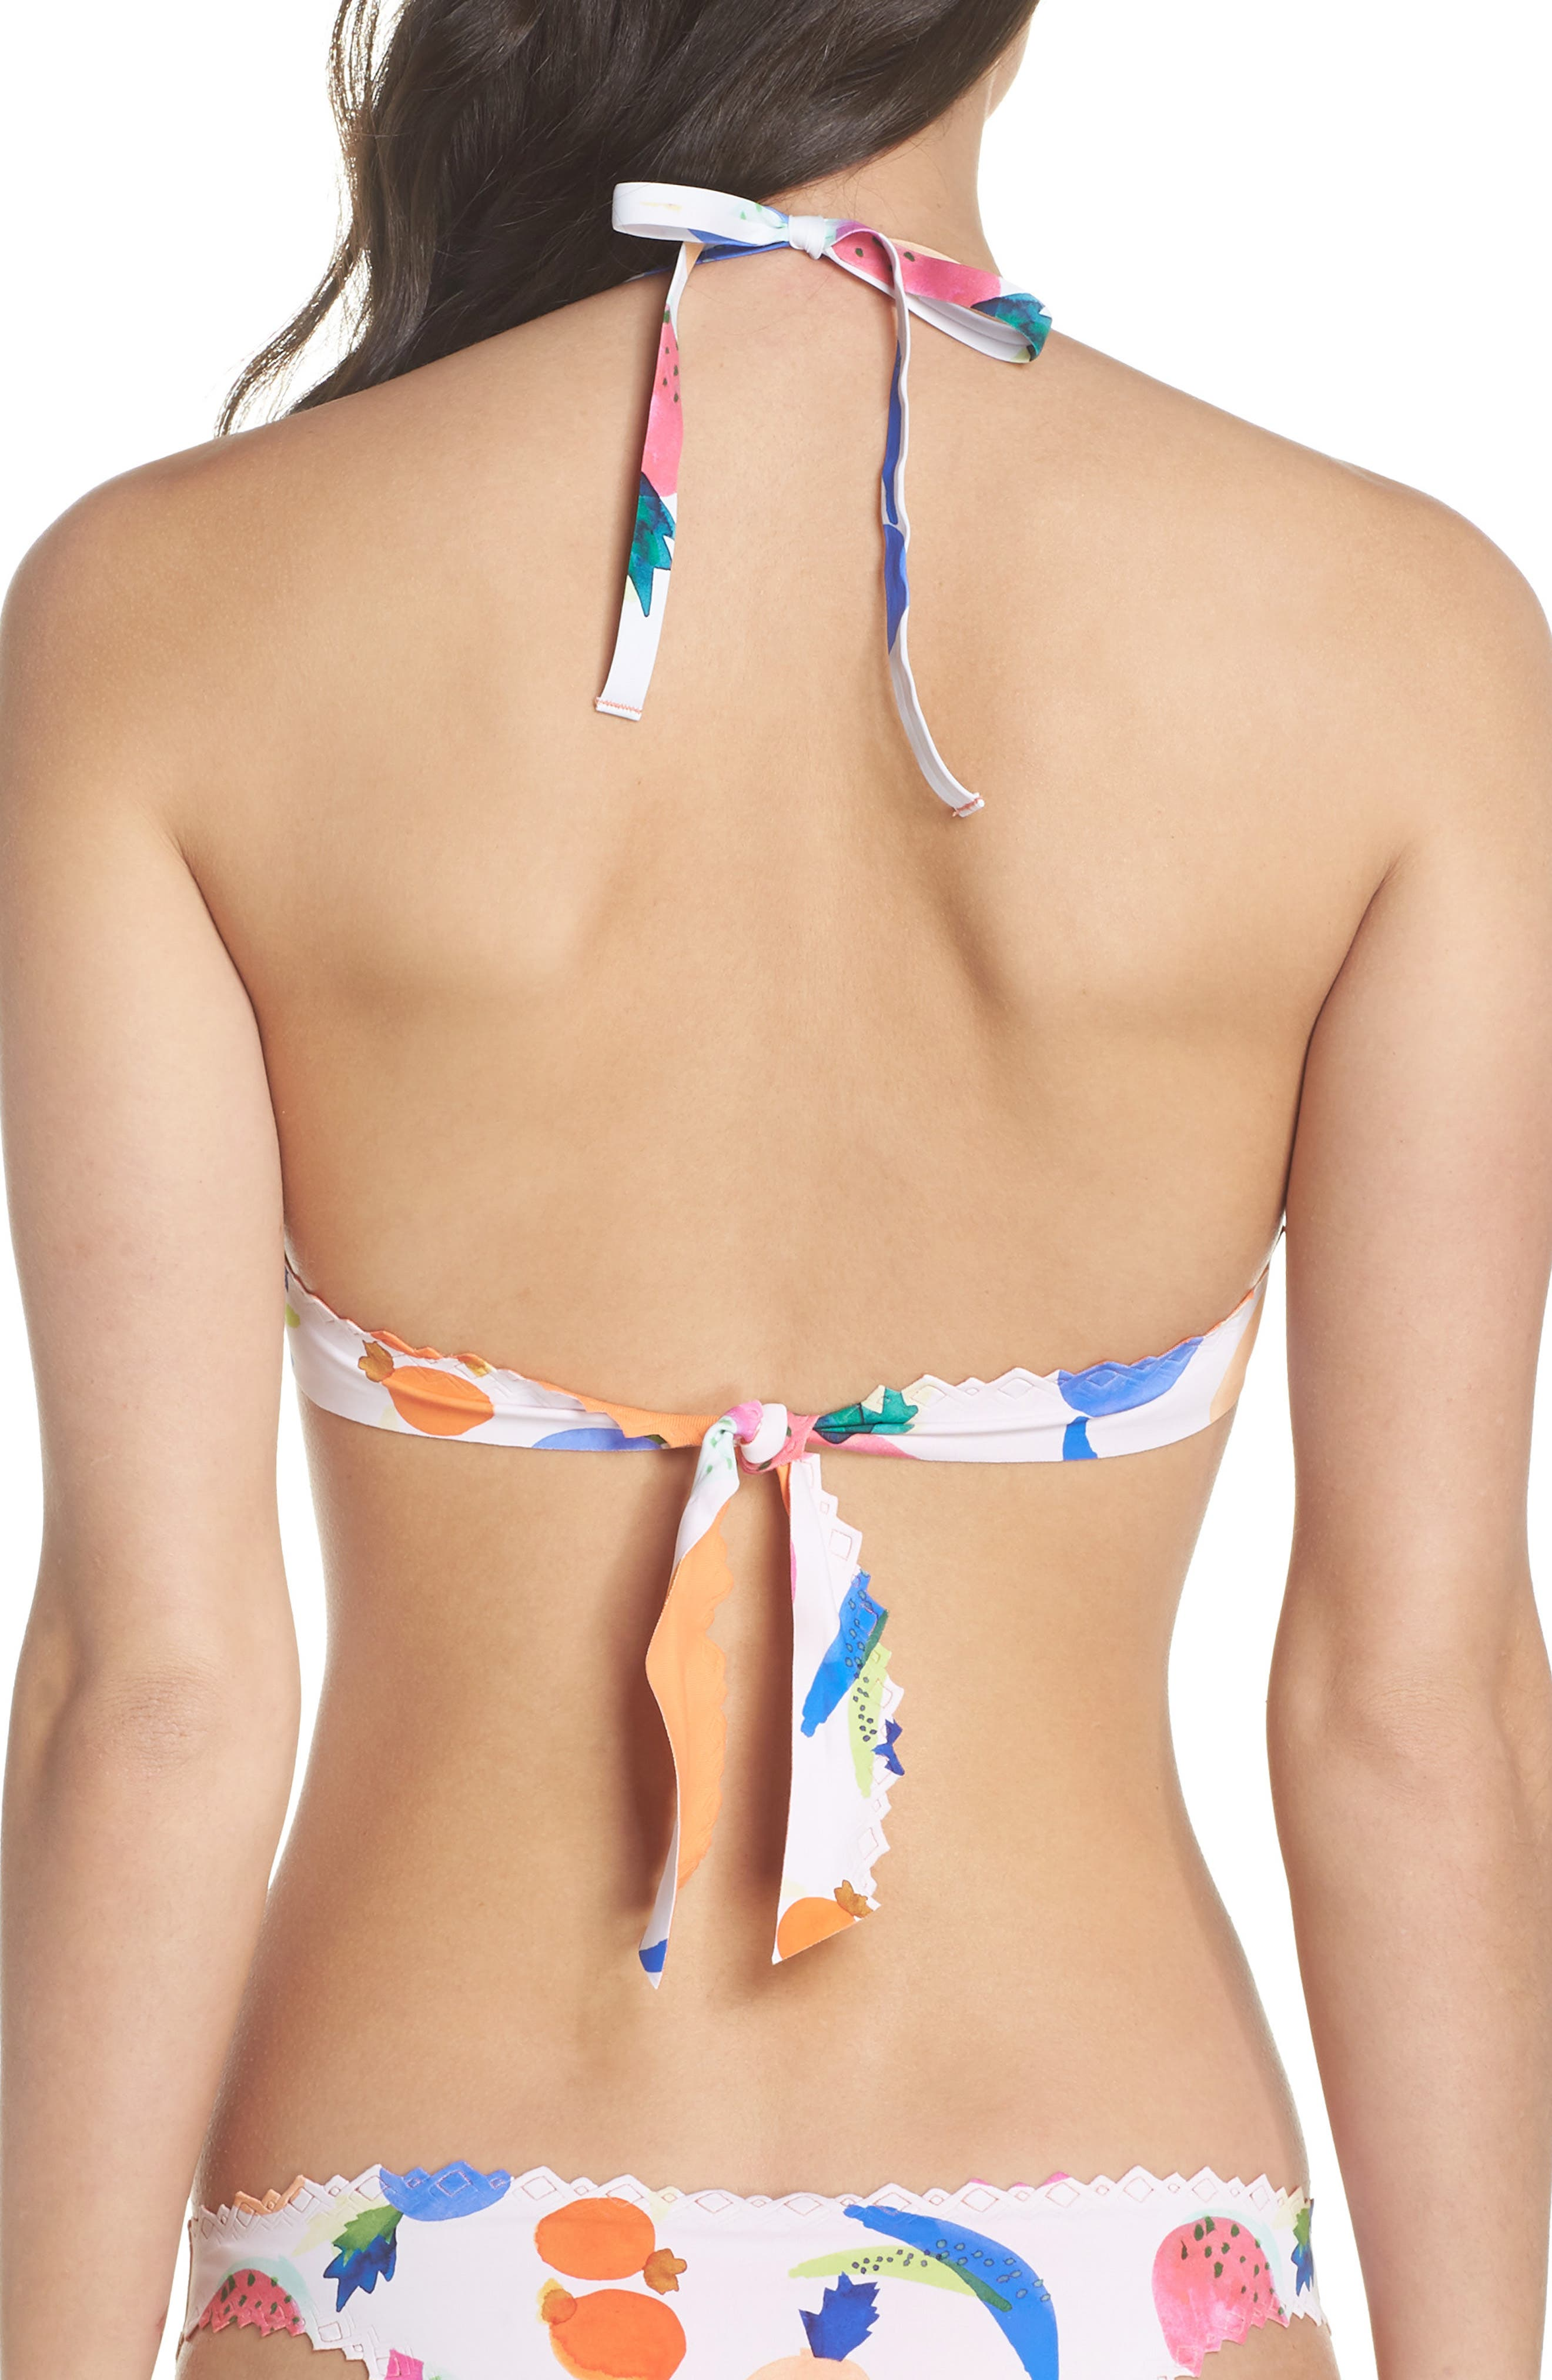 Copacabana Reversible Bikini Top,                             Alternate thumbnail 2, color,                             Copacabana